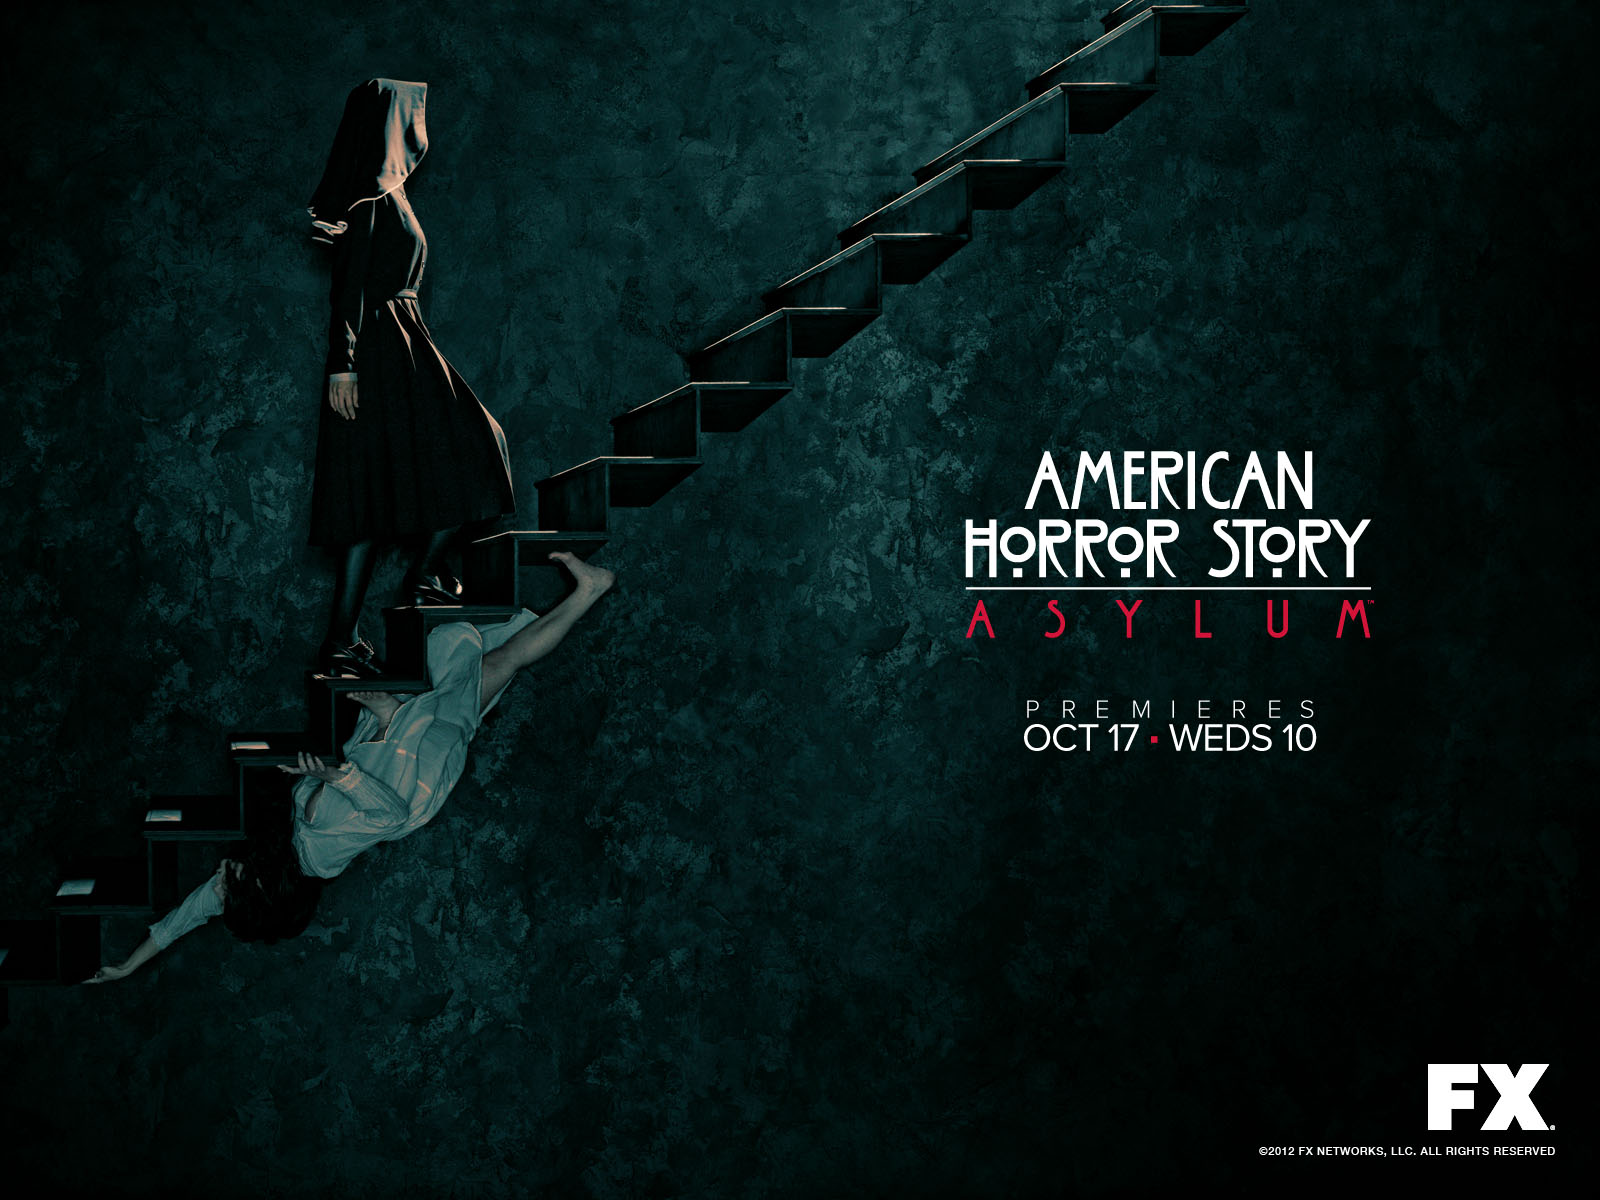 American horror story asylum tv series hd wallpapers hq - Ahs wallpaper ...